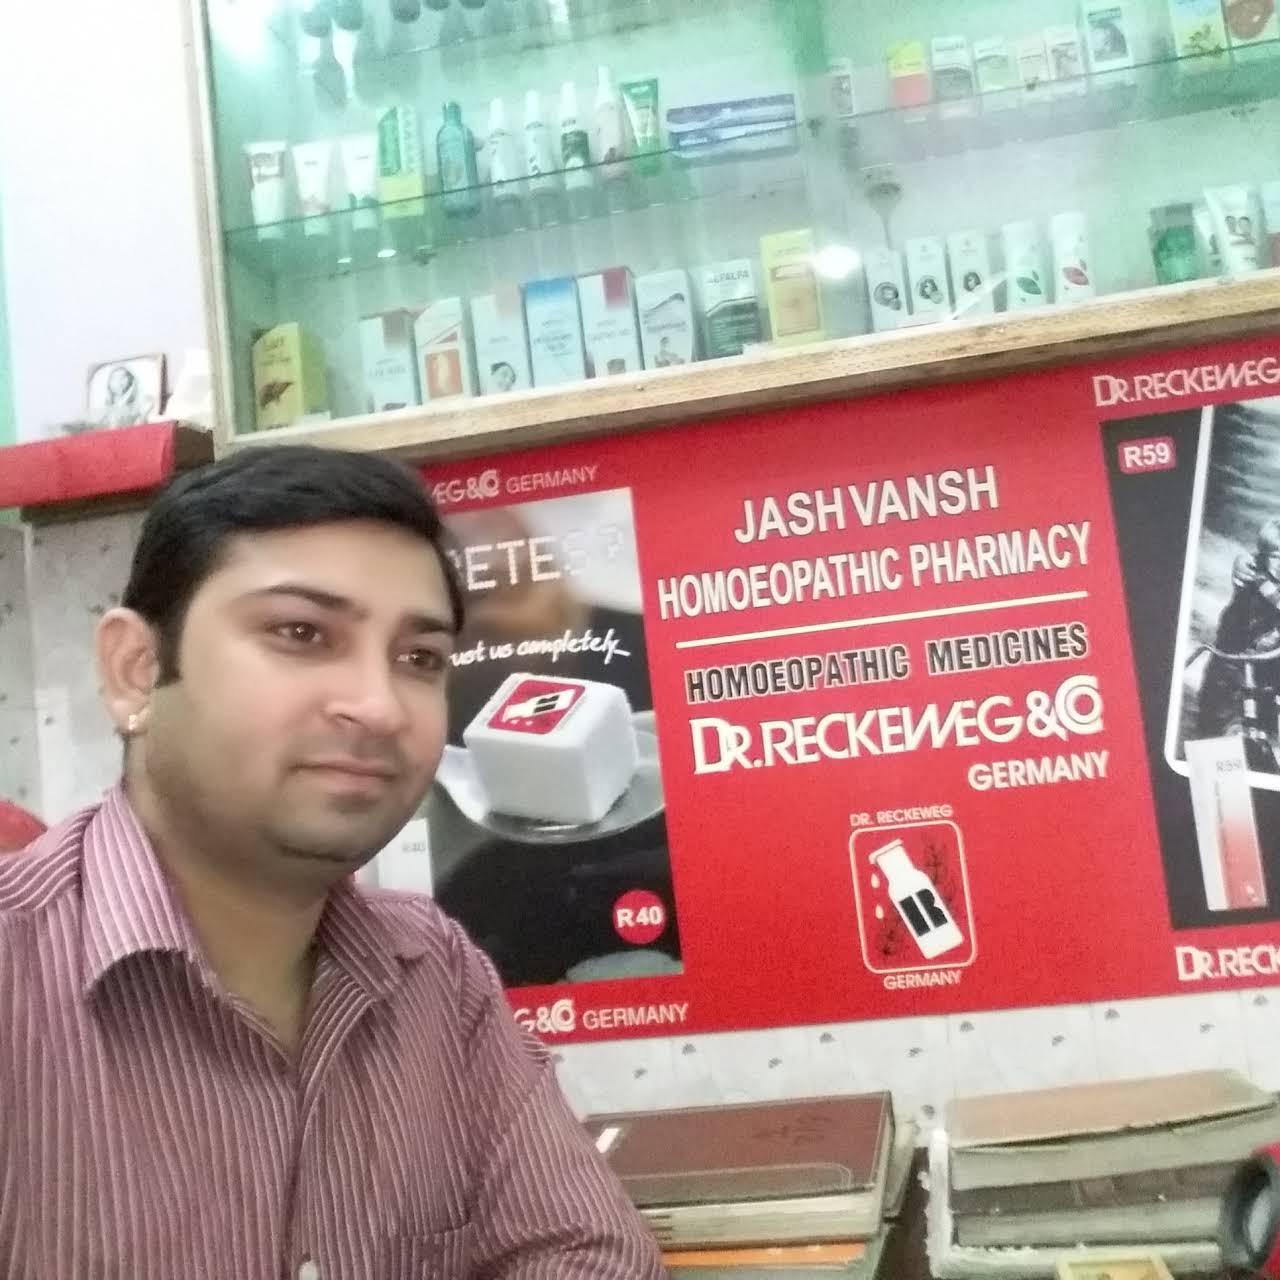 Jashvansh homoeopathic pharmacy - Homeopathic Pharmacy in Delhi